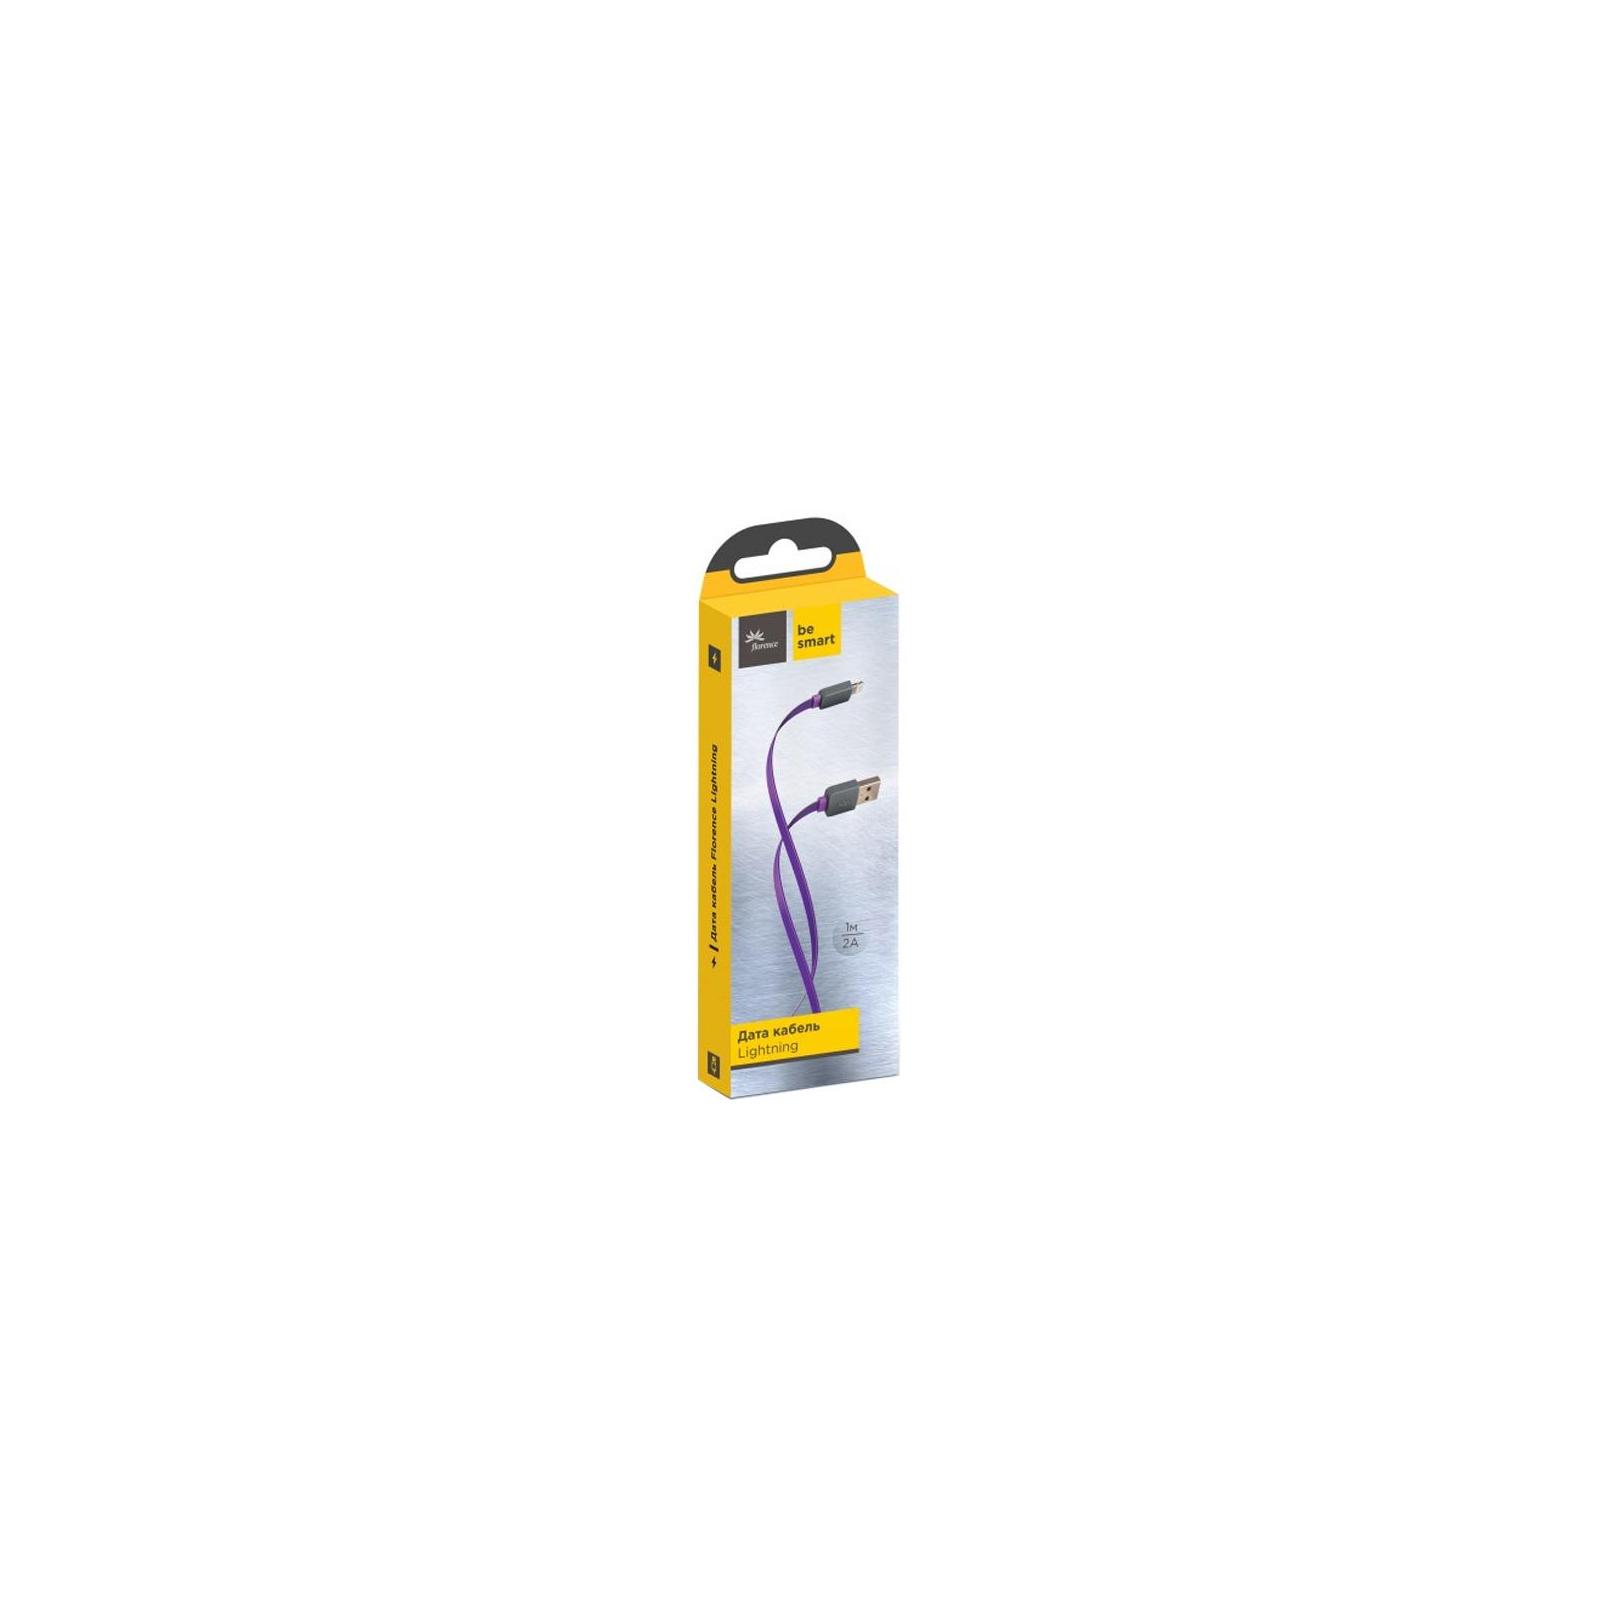 Дата кабель USB 2.0 AM to Lightning 1.0m Color Purple Florence (FDC-L1-2P)